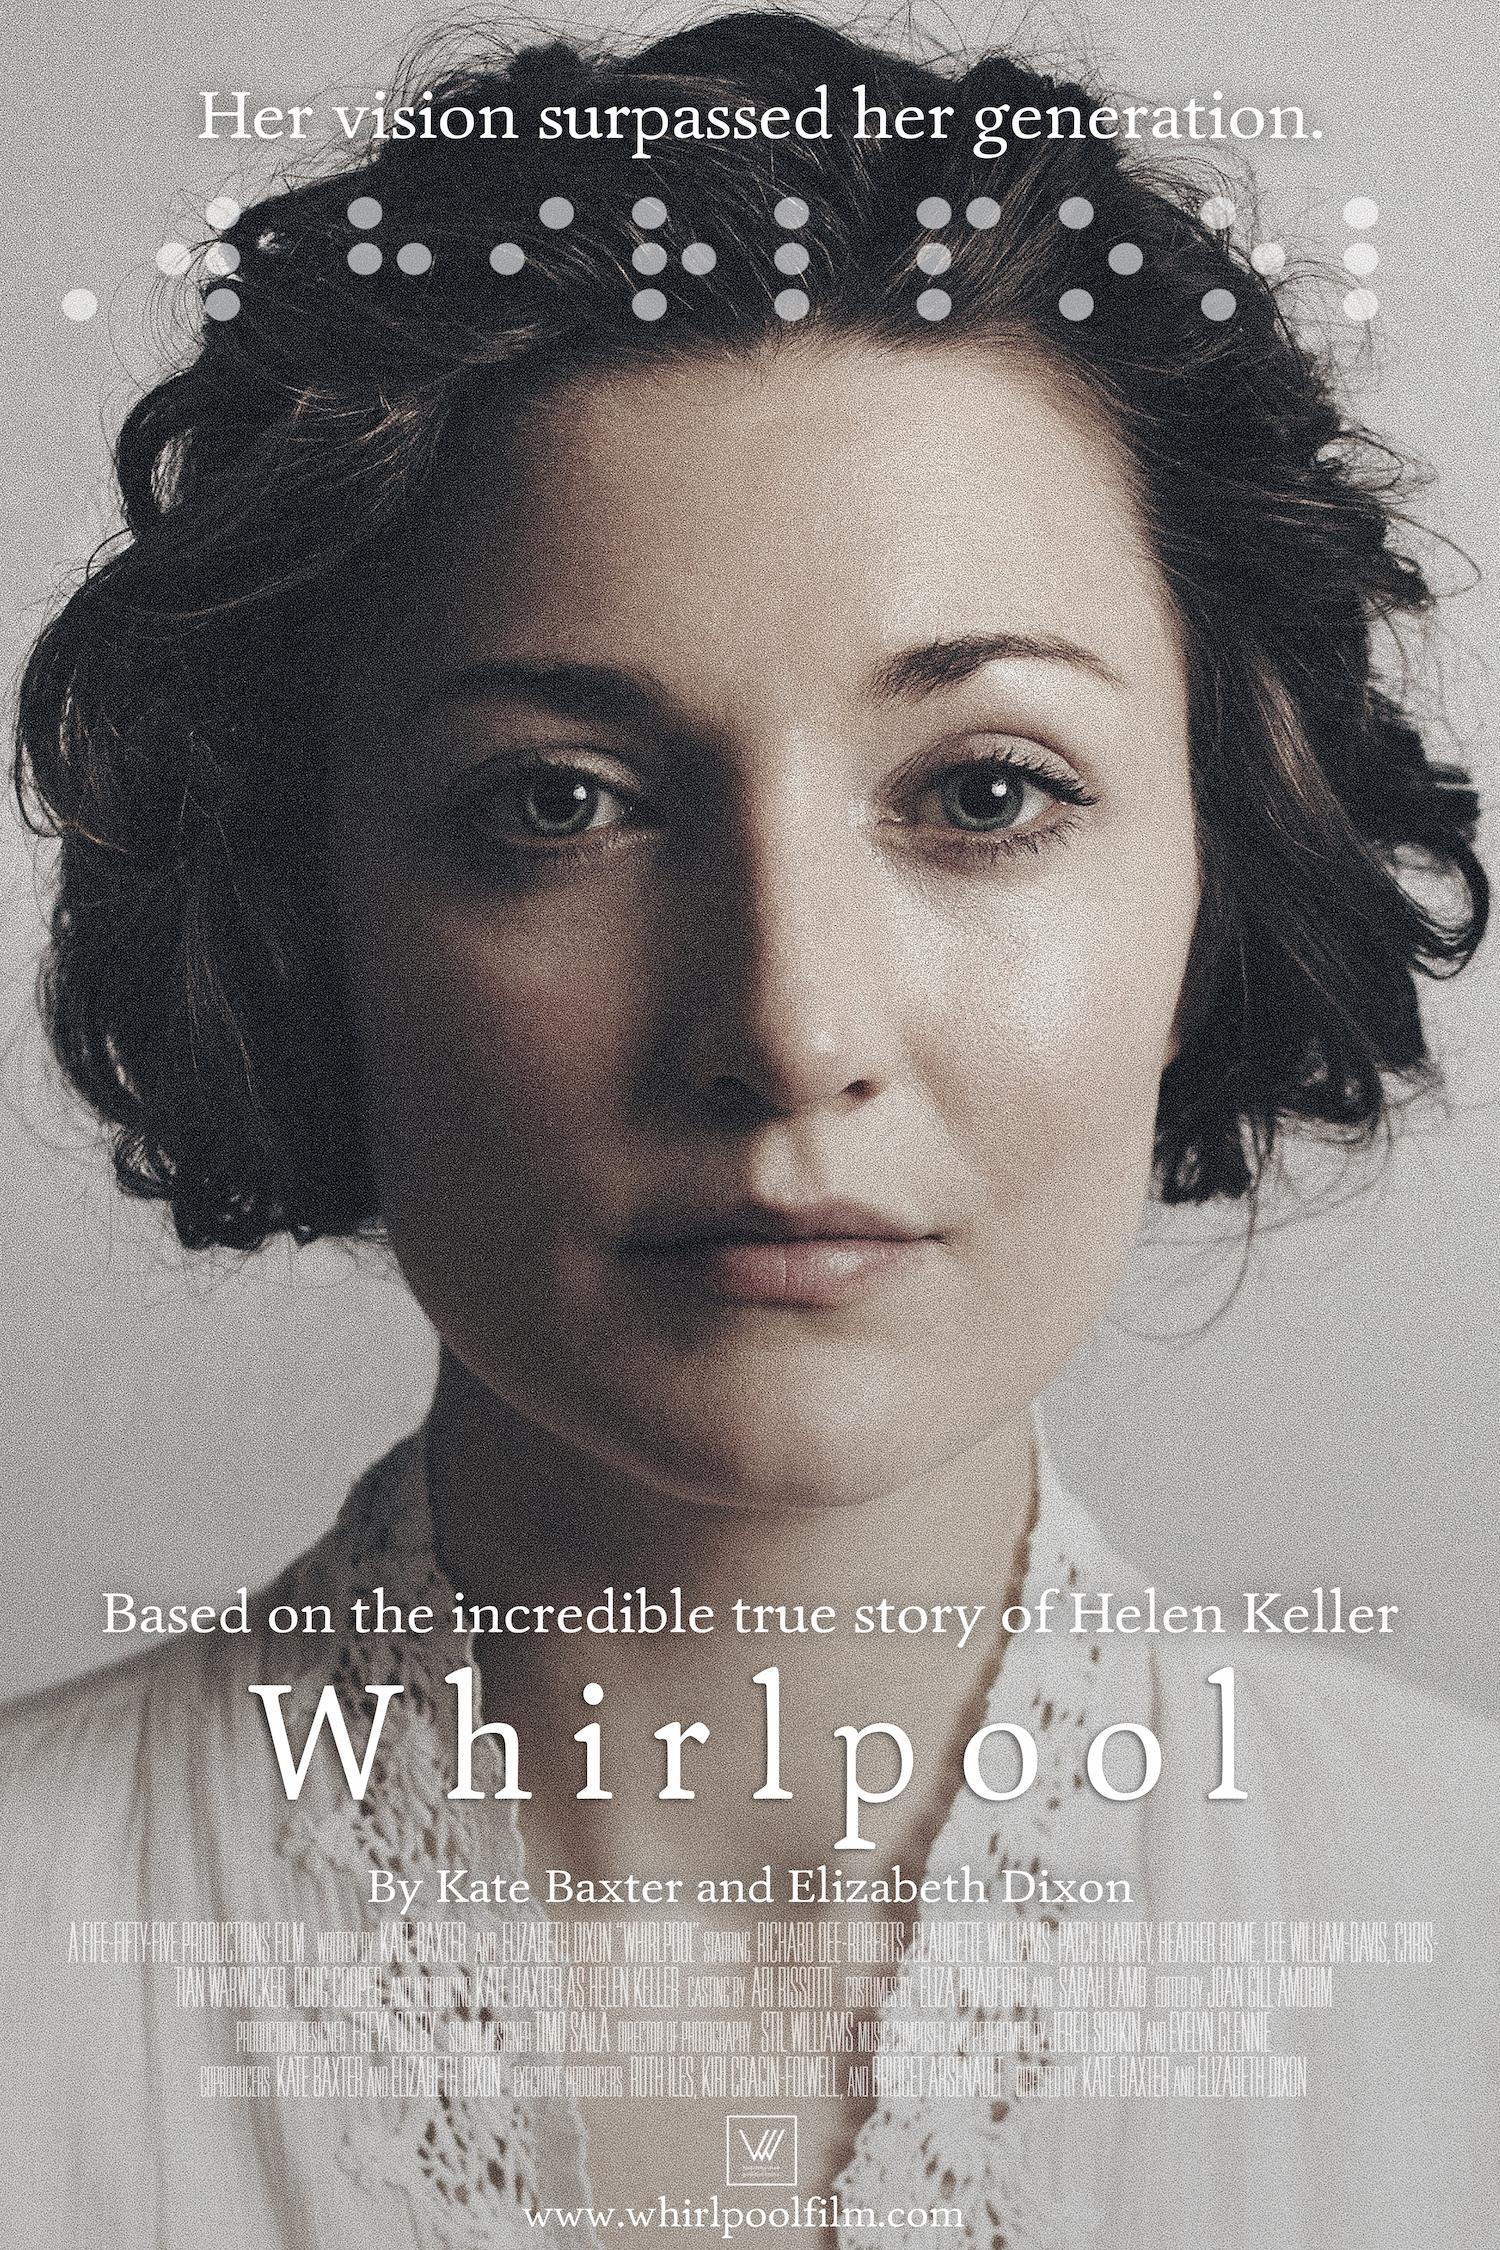 WHIRLPOOL Poster (1.5MB).jpg